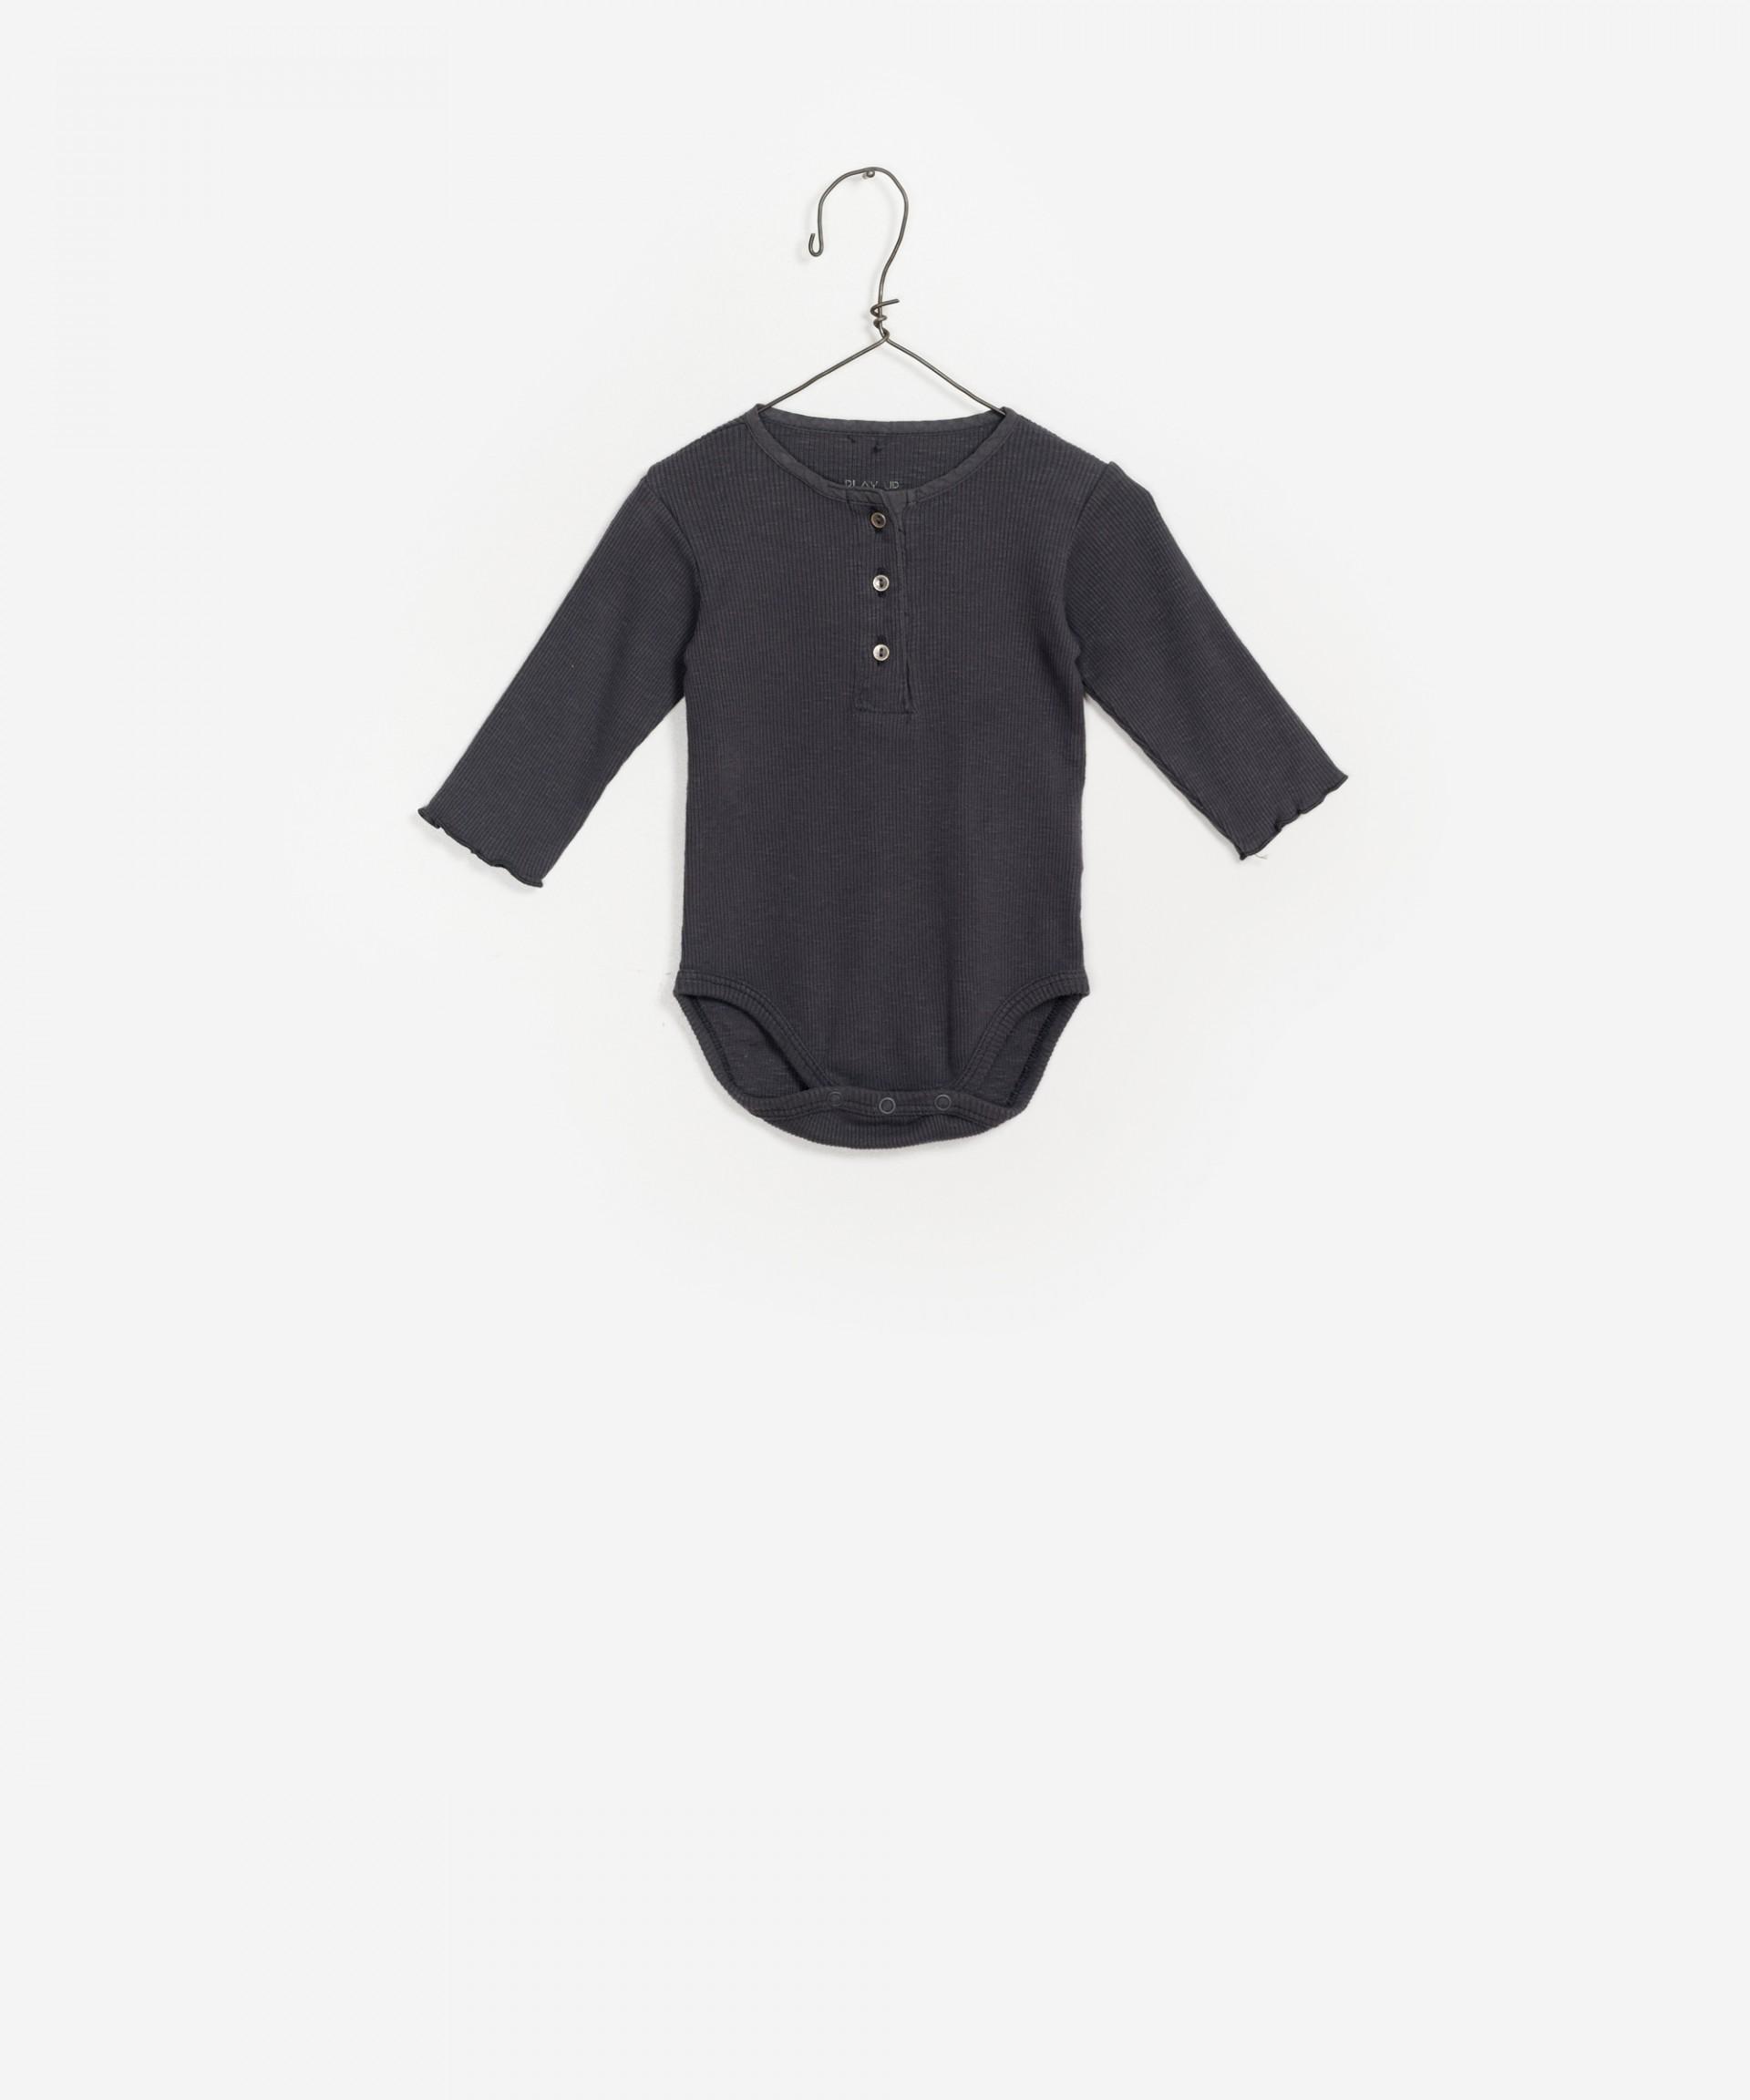 Body para bebé, manga larga, sin cuello